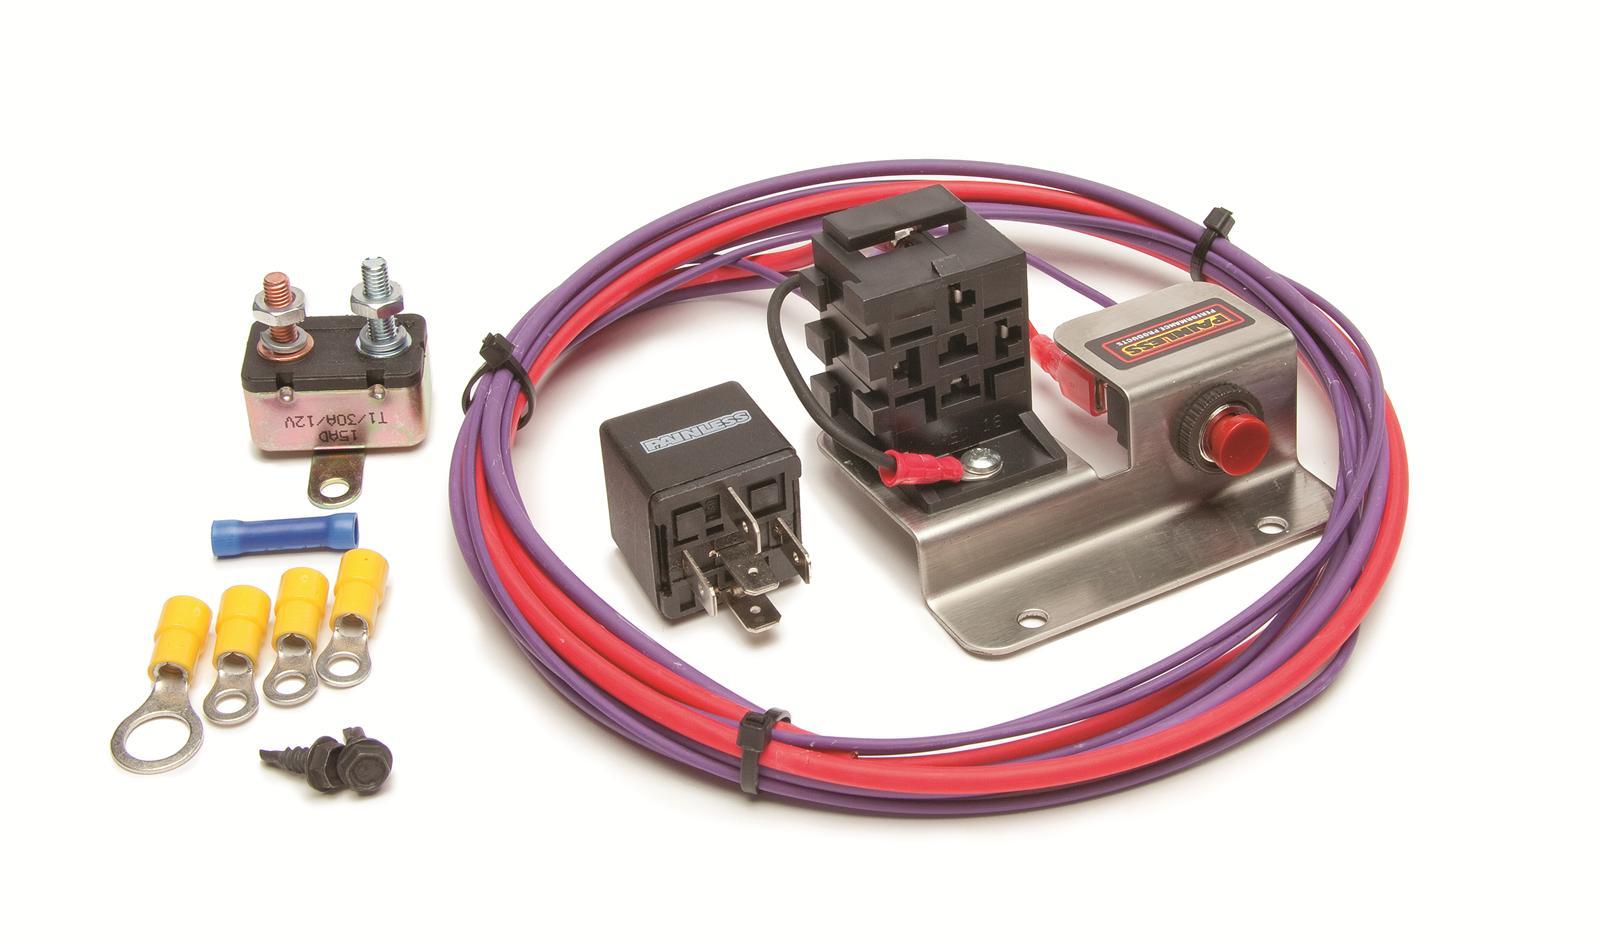 painless wiring 30201 starter solenoid kit hot start plus engine bump system kit ebay. Black Bedroom Furniture Sets. Home Design Ideas